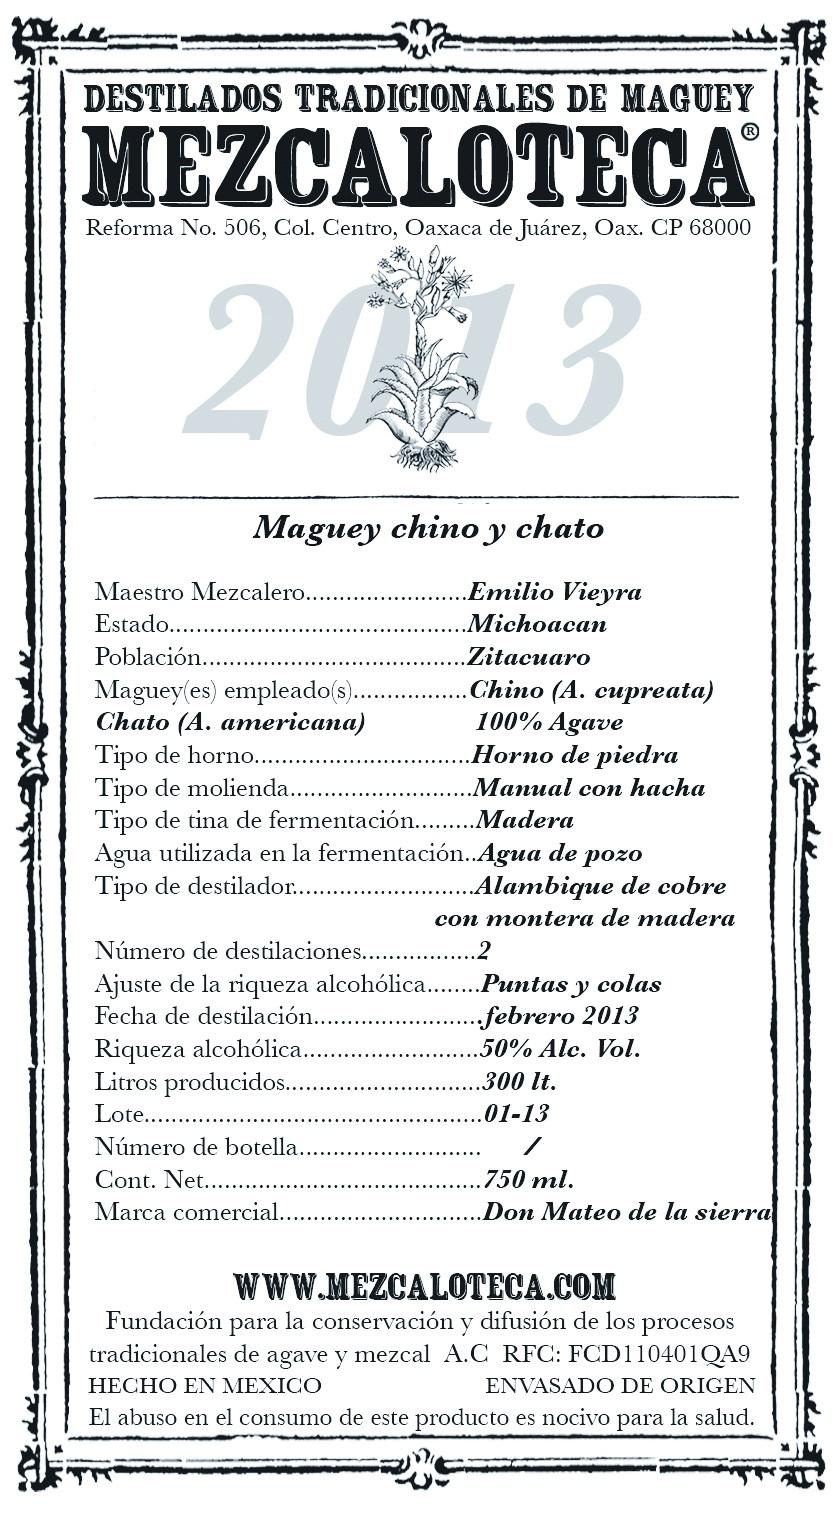 michoacan.EV.chino.chato.750.2013[1]_1 web.jpg